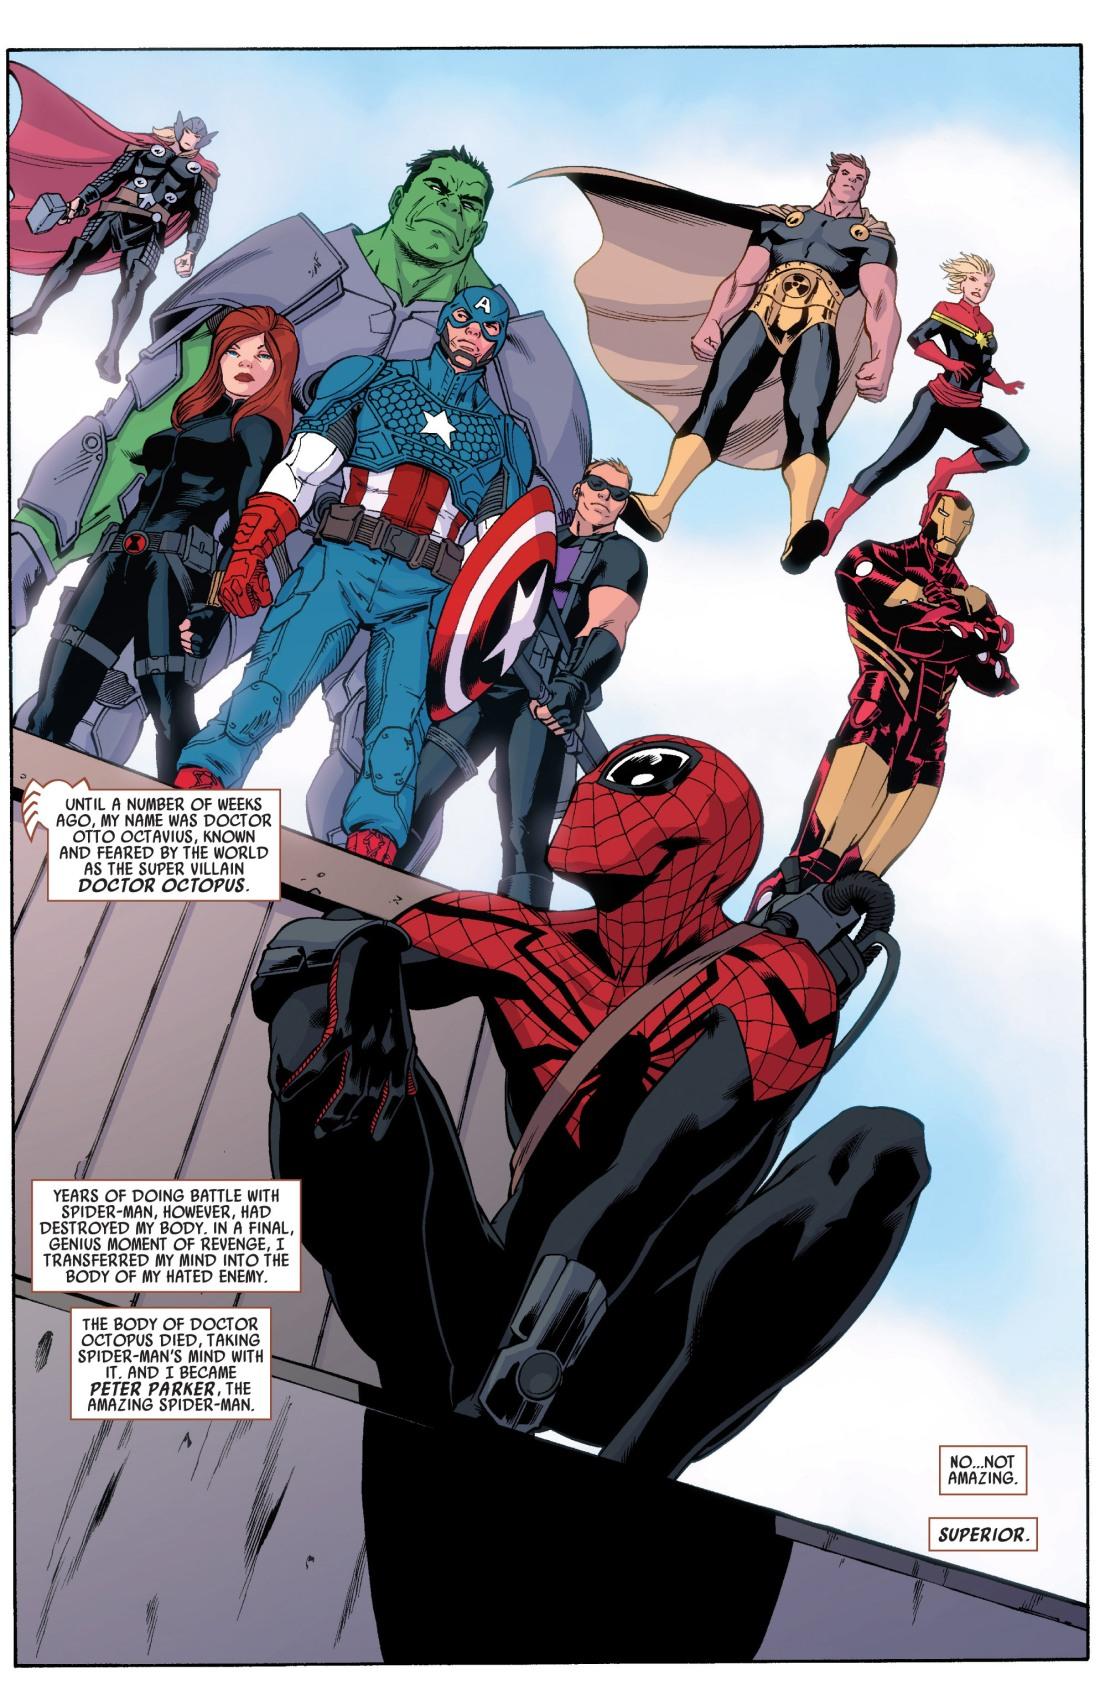 Superior_Spider-Man_primer